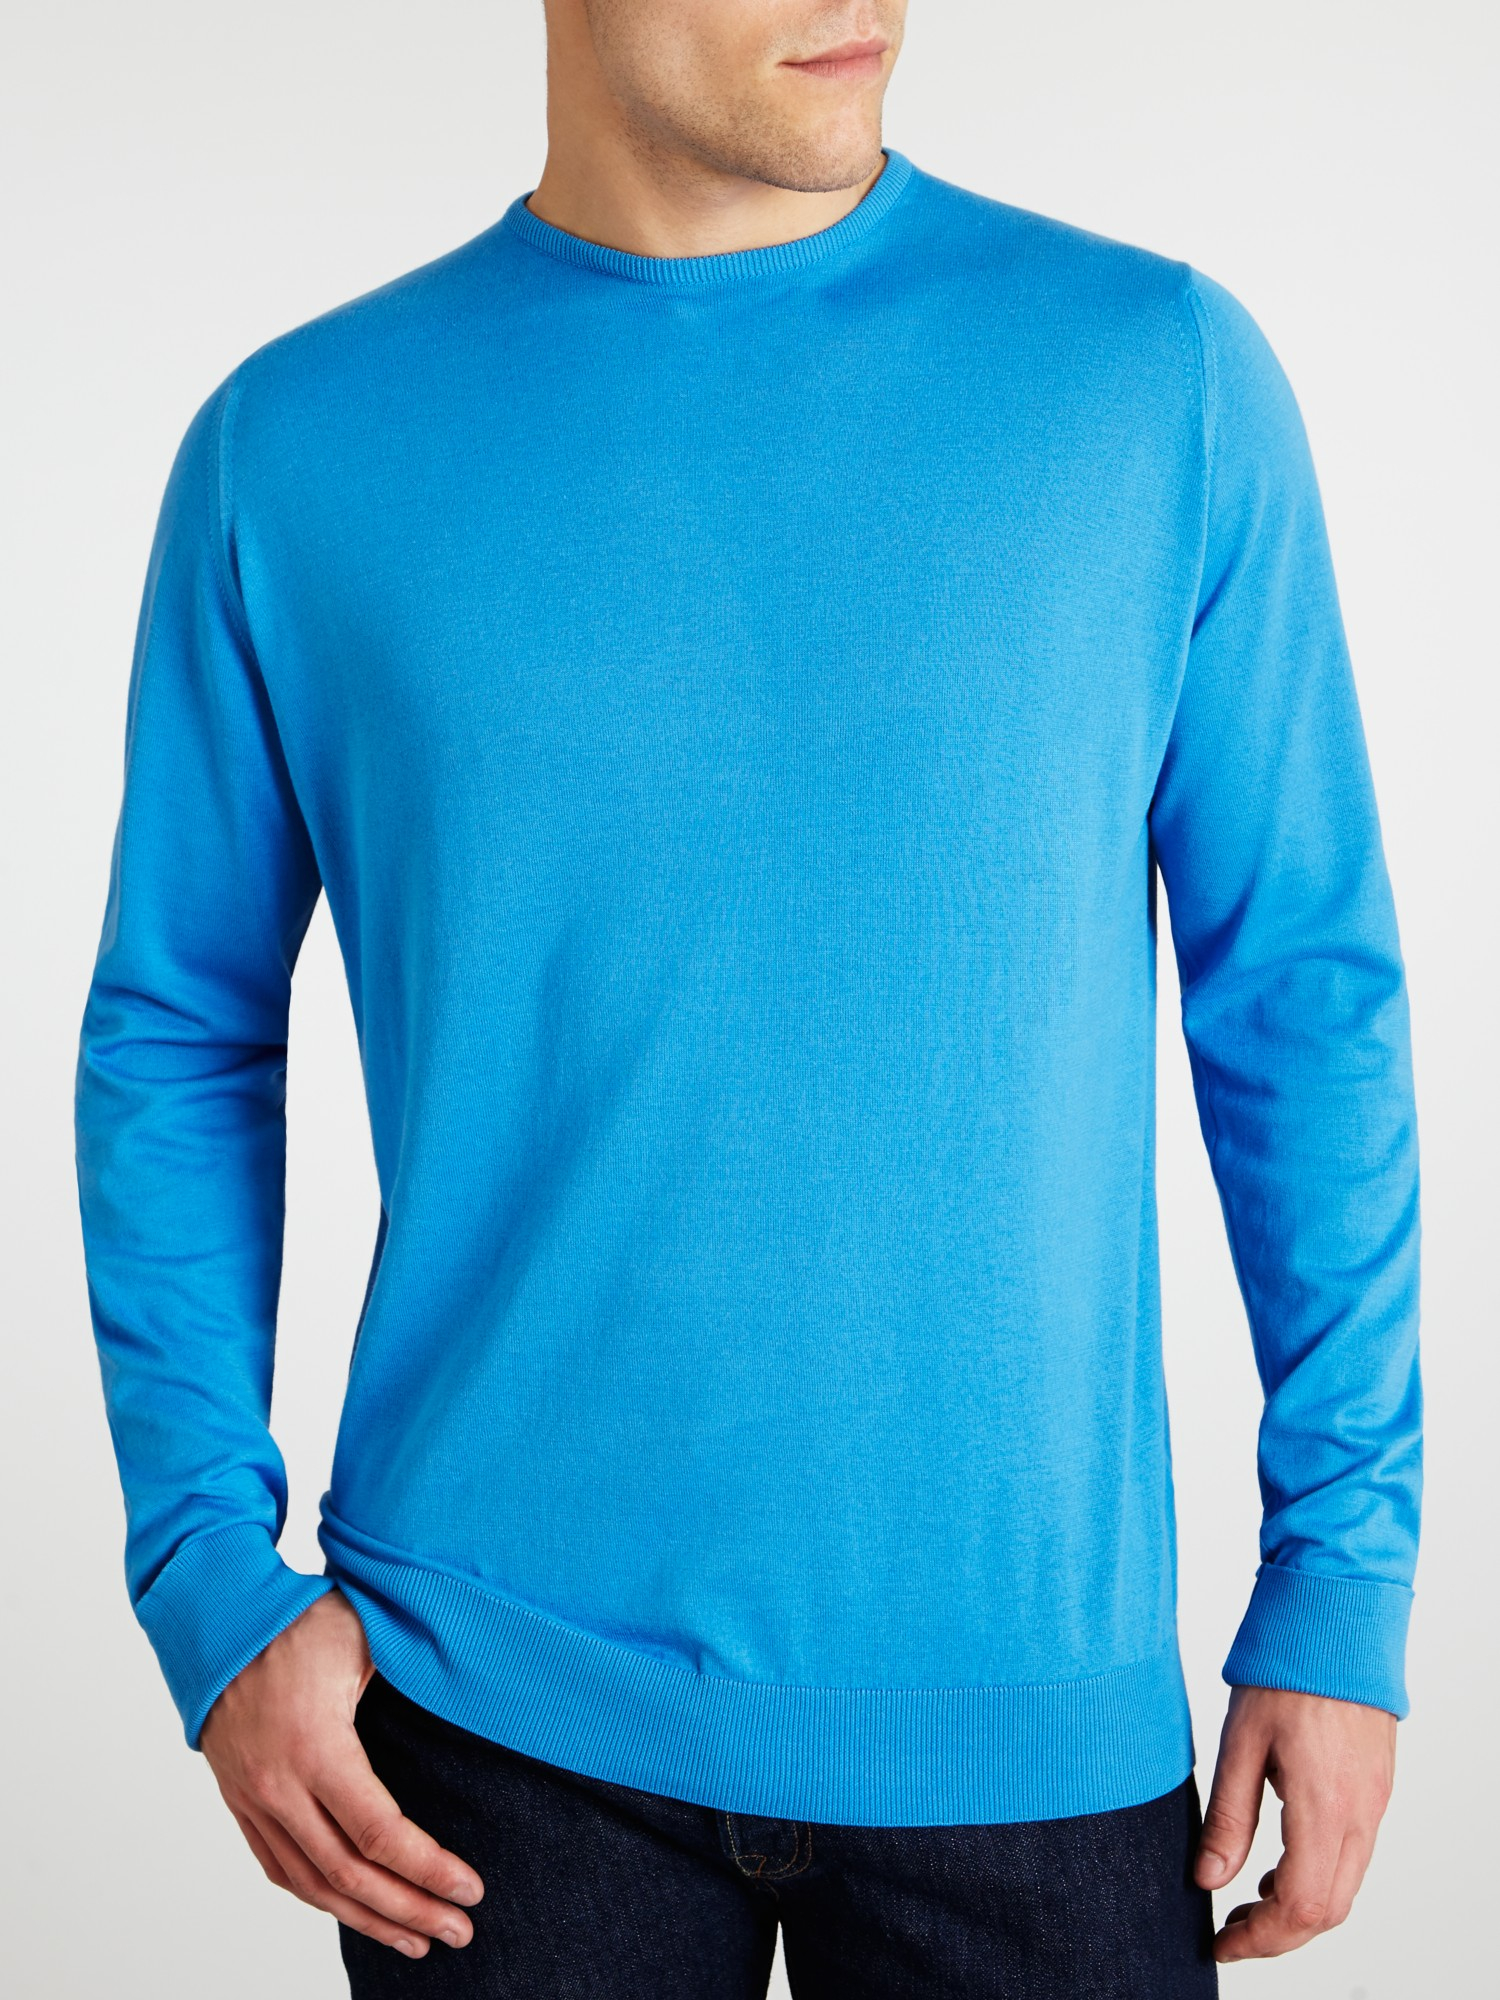 John Smedley - Black Sea Island Cotton Lyndhurst PulloverThe iconic style Lyndhurst is a long sleeved, crew neck pullover in John Smedley's Sea Island Cotton. R. M Browse / search.